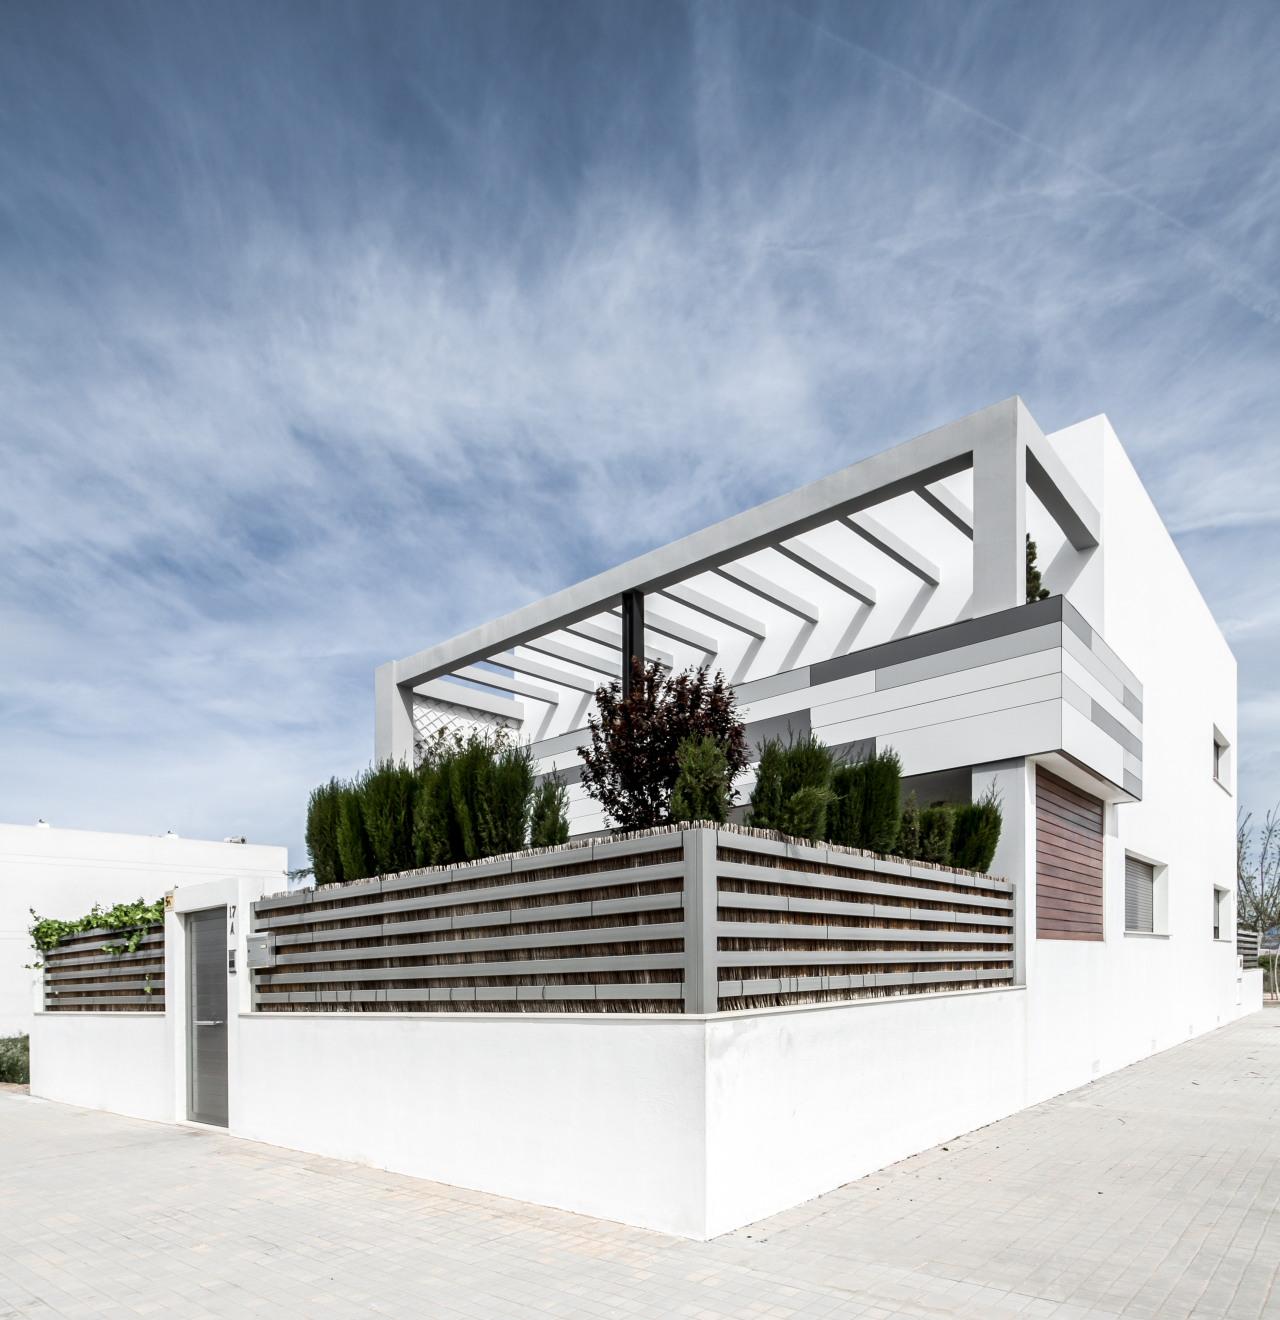 fotografia-arquitectura-valencia-german-cabo-viraje-v02 (2)